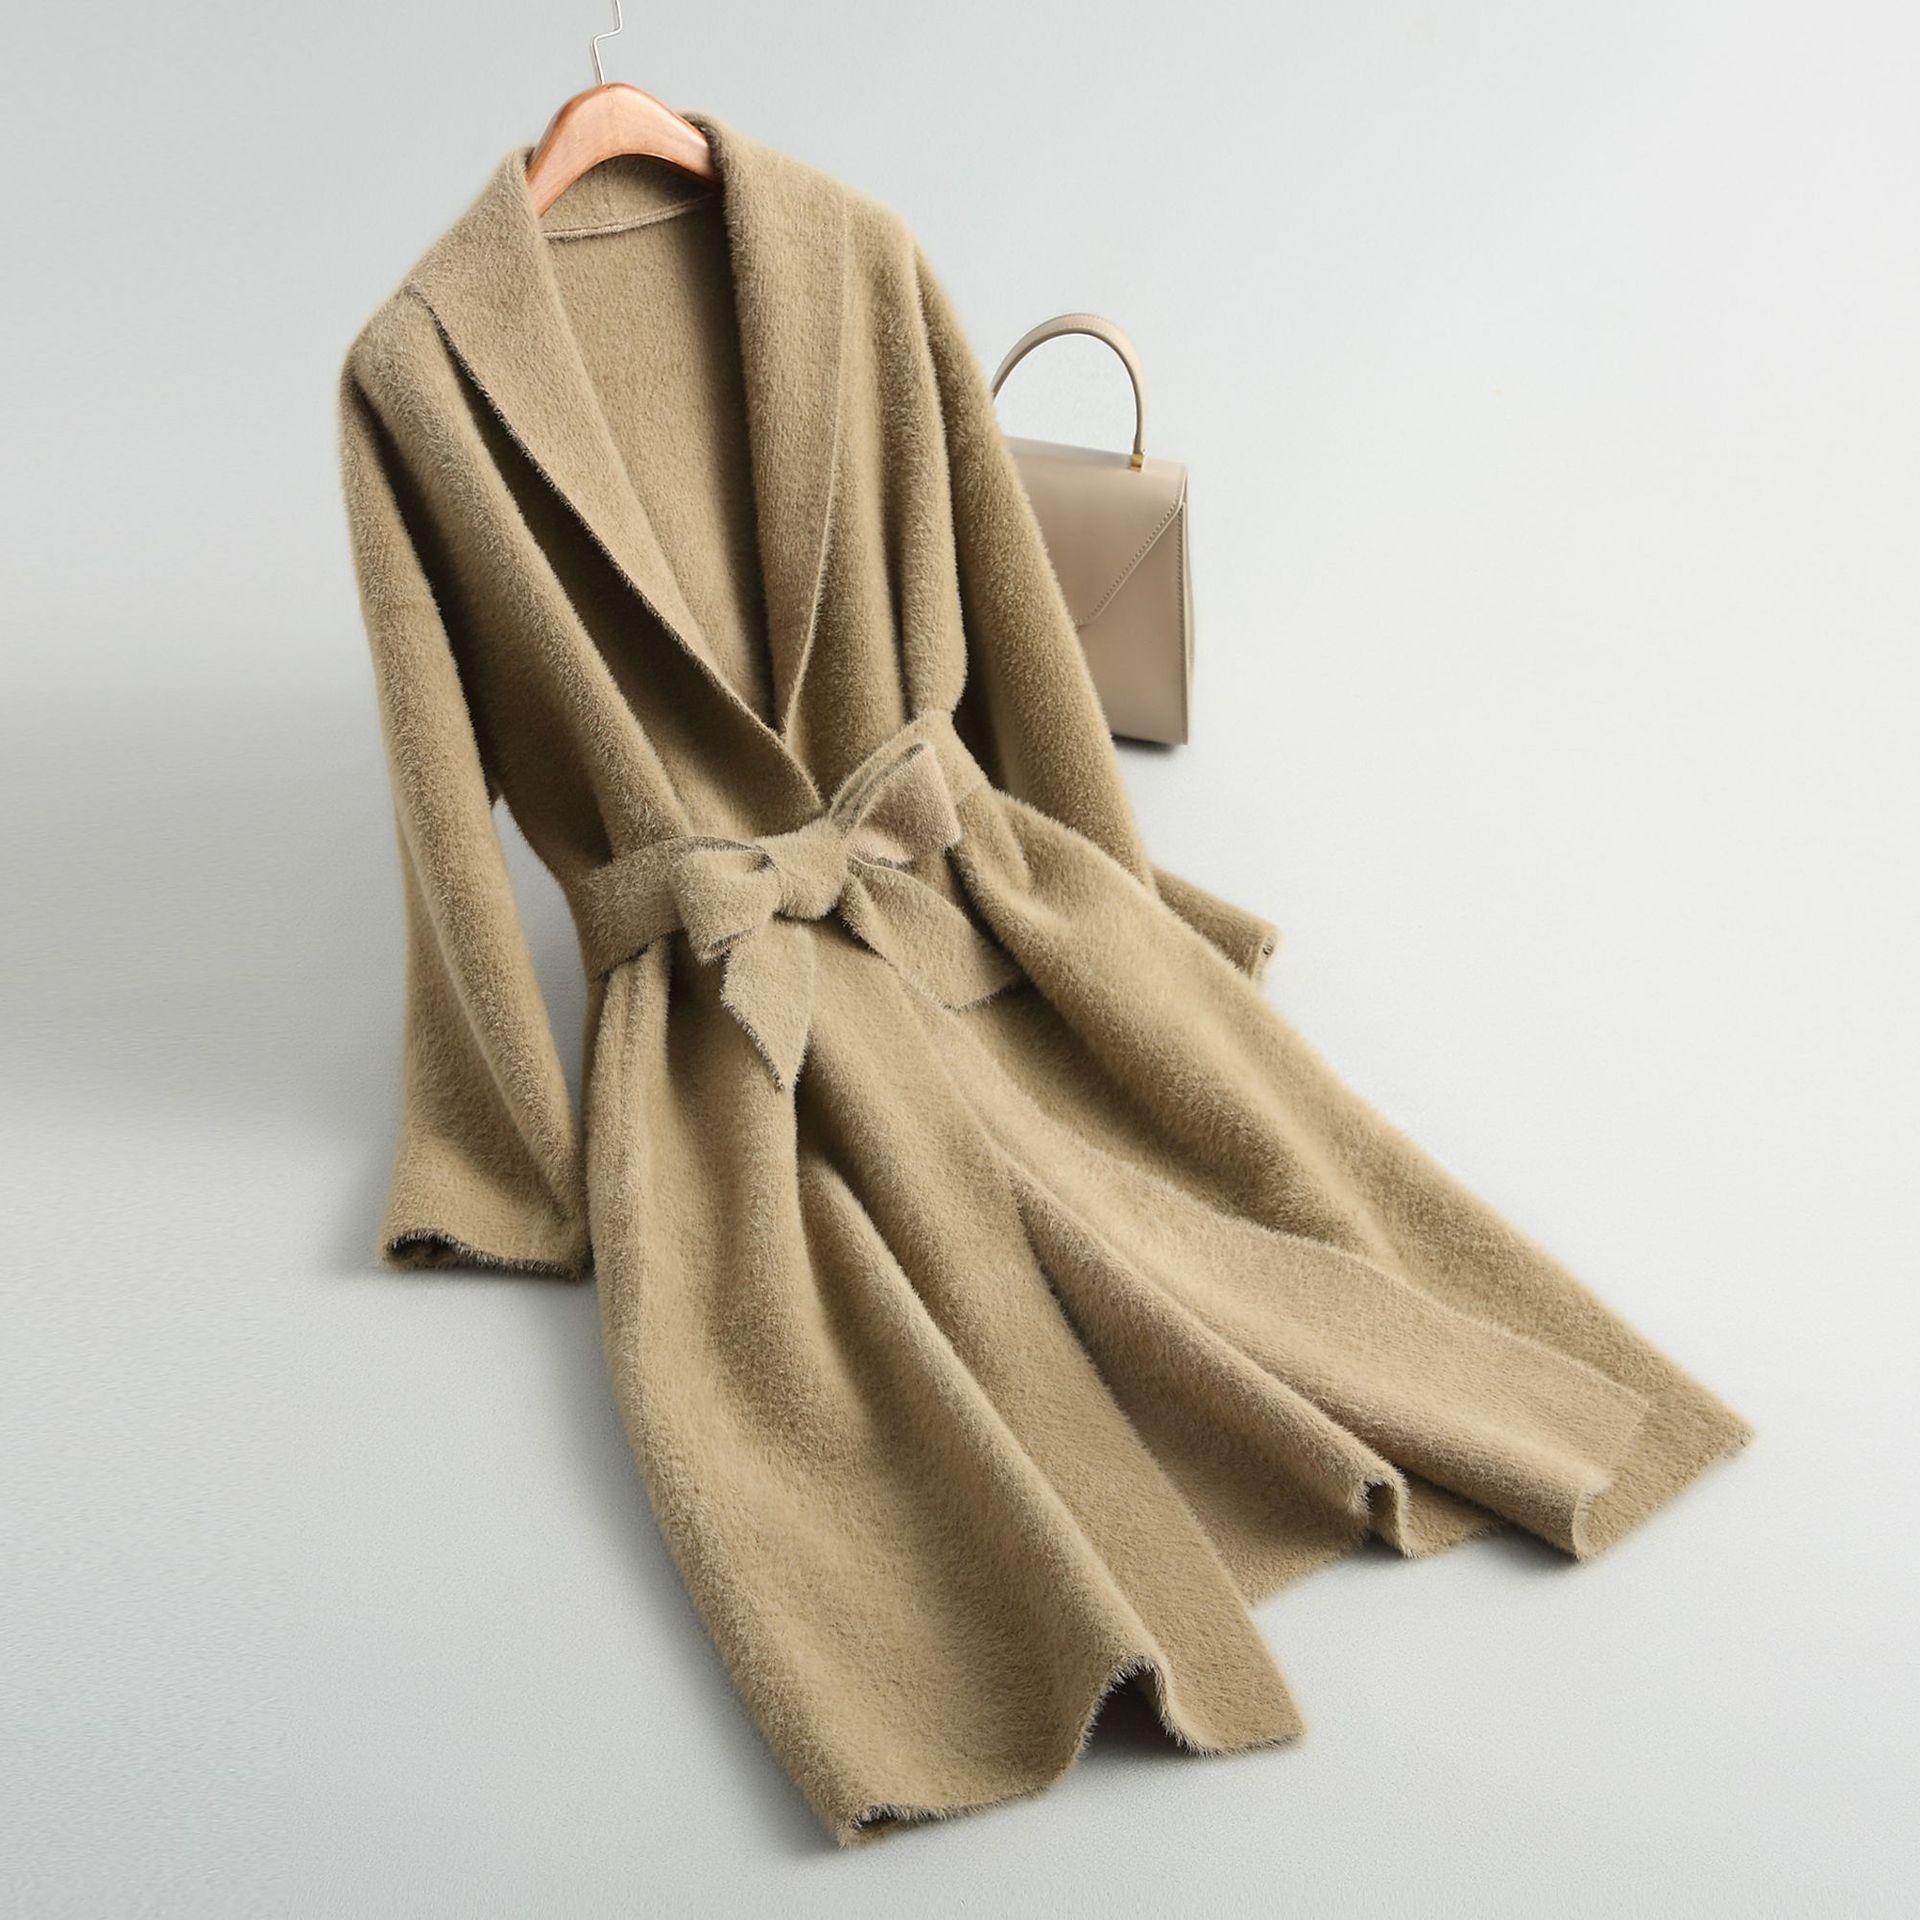 Velours Innasofan Camel Ceinture Rabattu Hiver Manteau Col Femelle n1HYqw0v